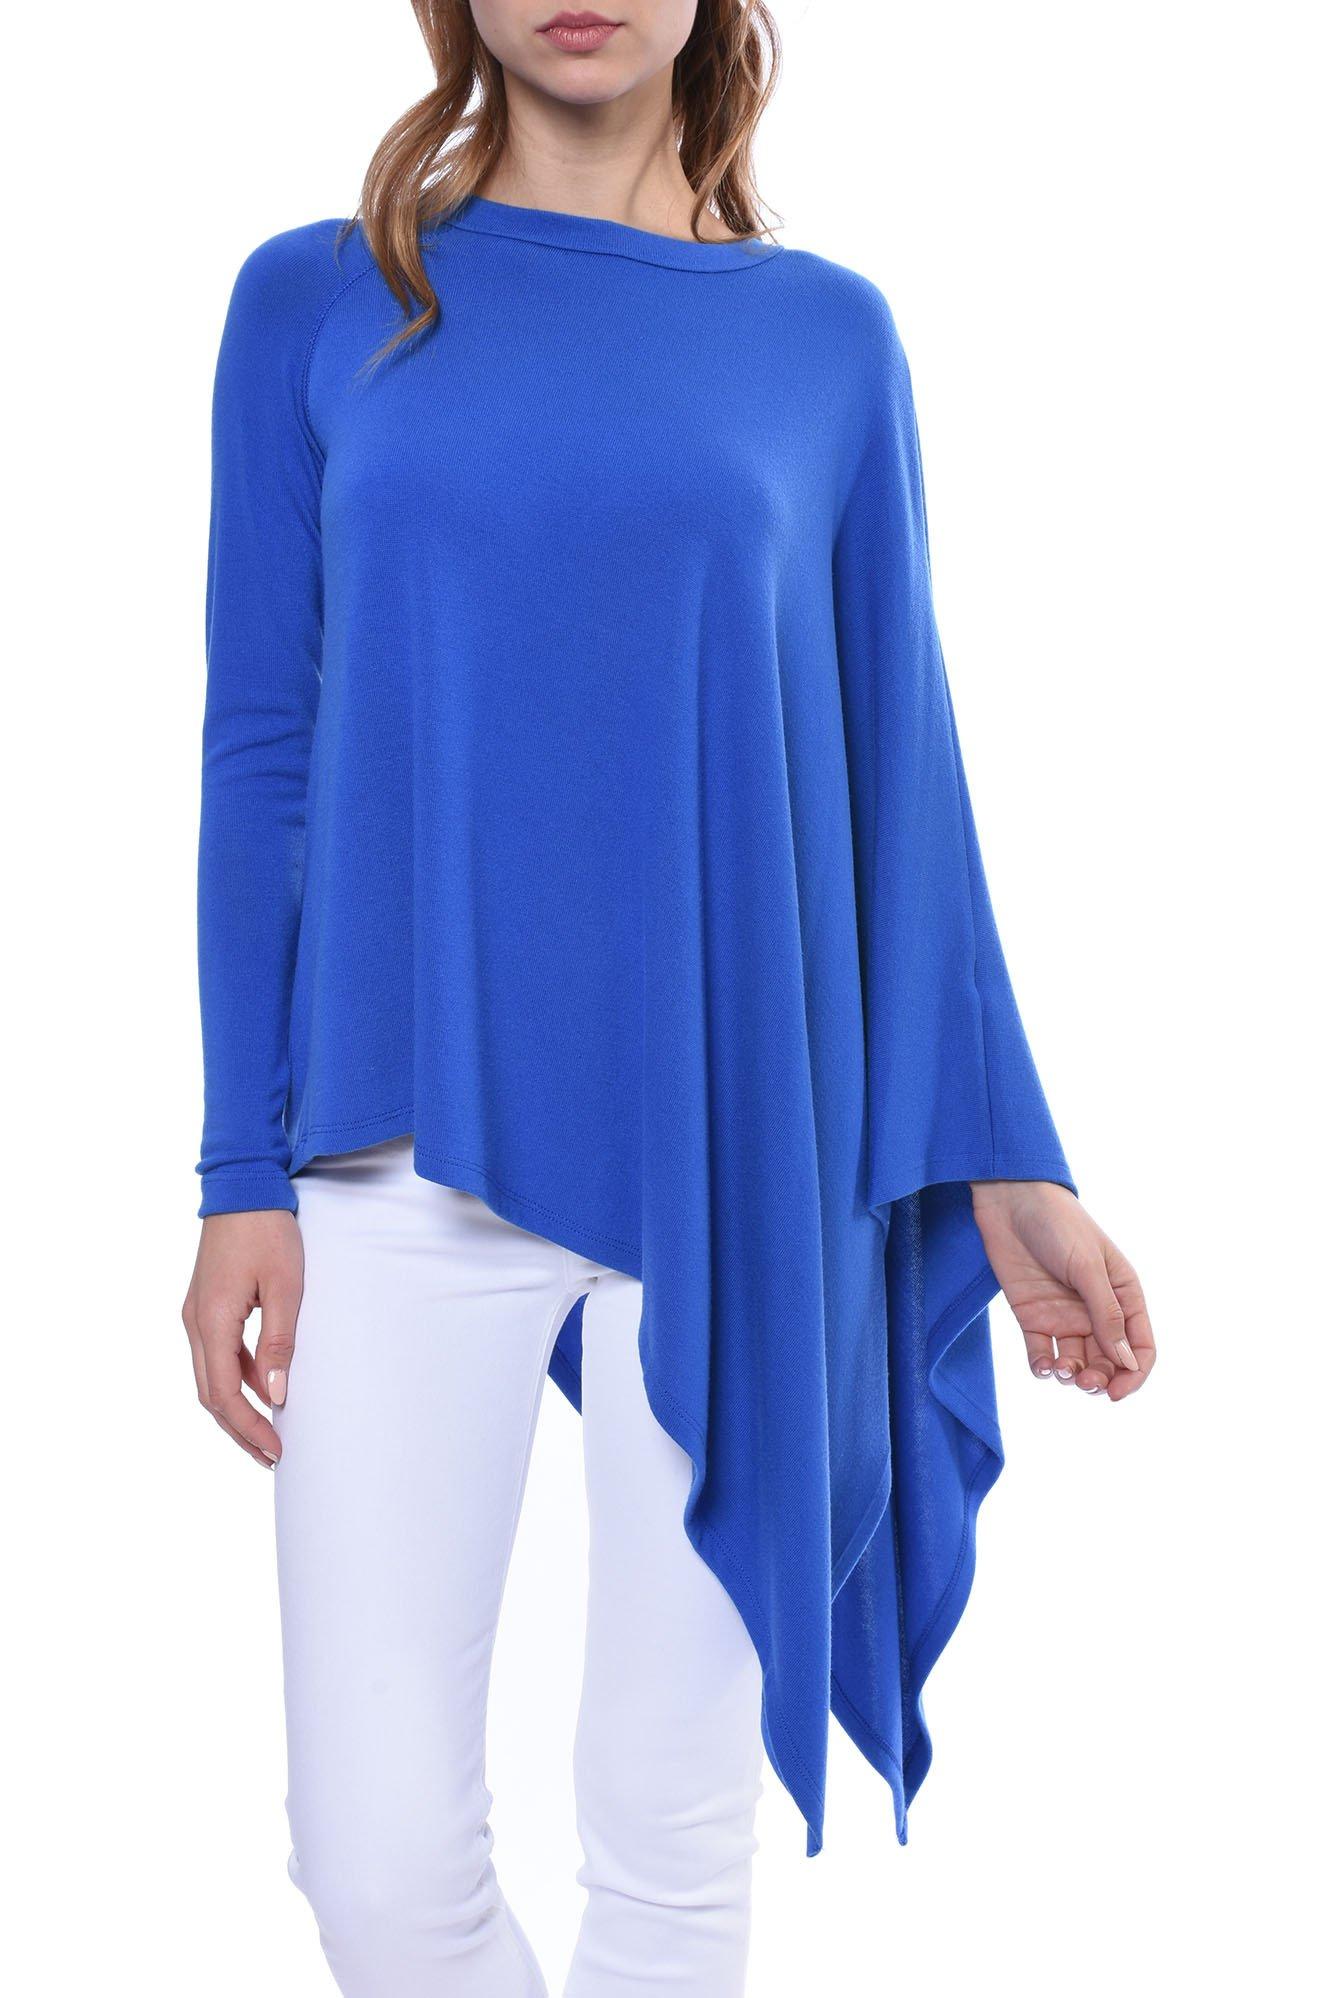 Asymmetric Cape Top (Style 3F43011, Royal Blue) by Fifteen Twenty